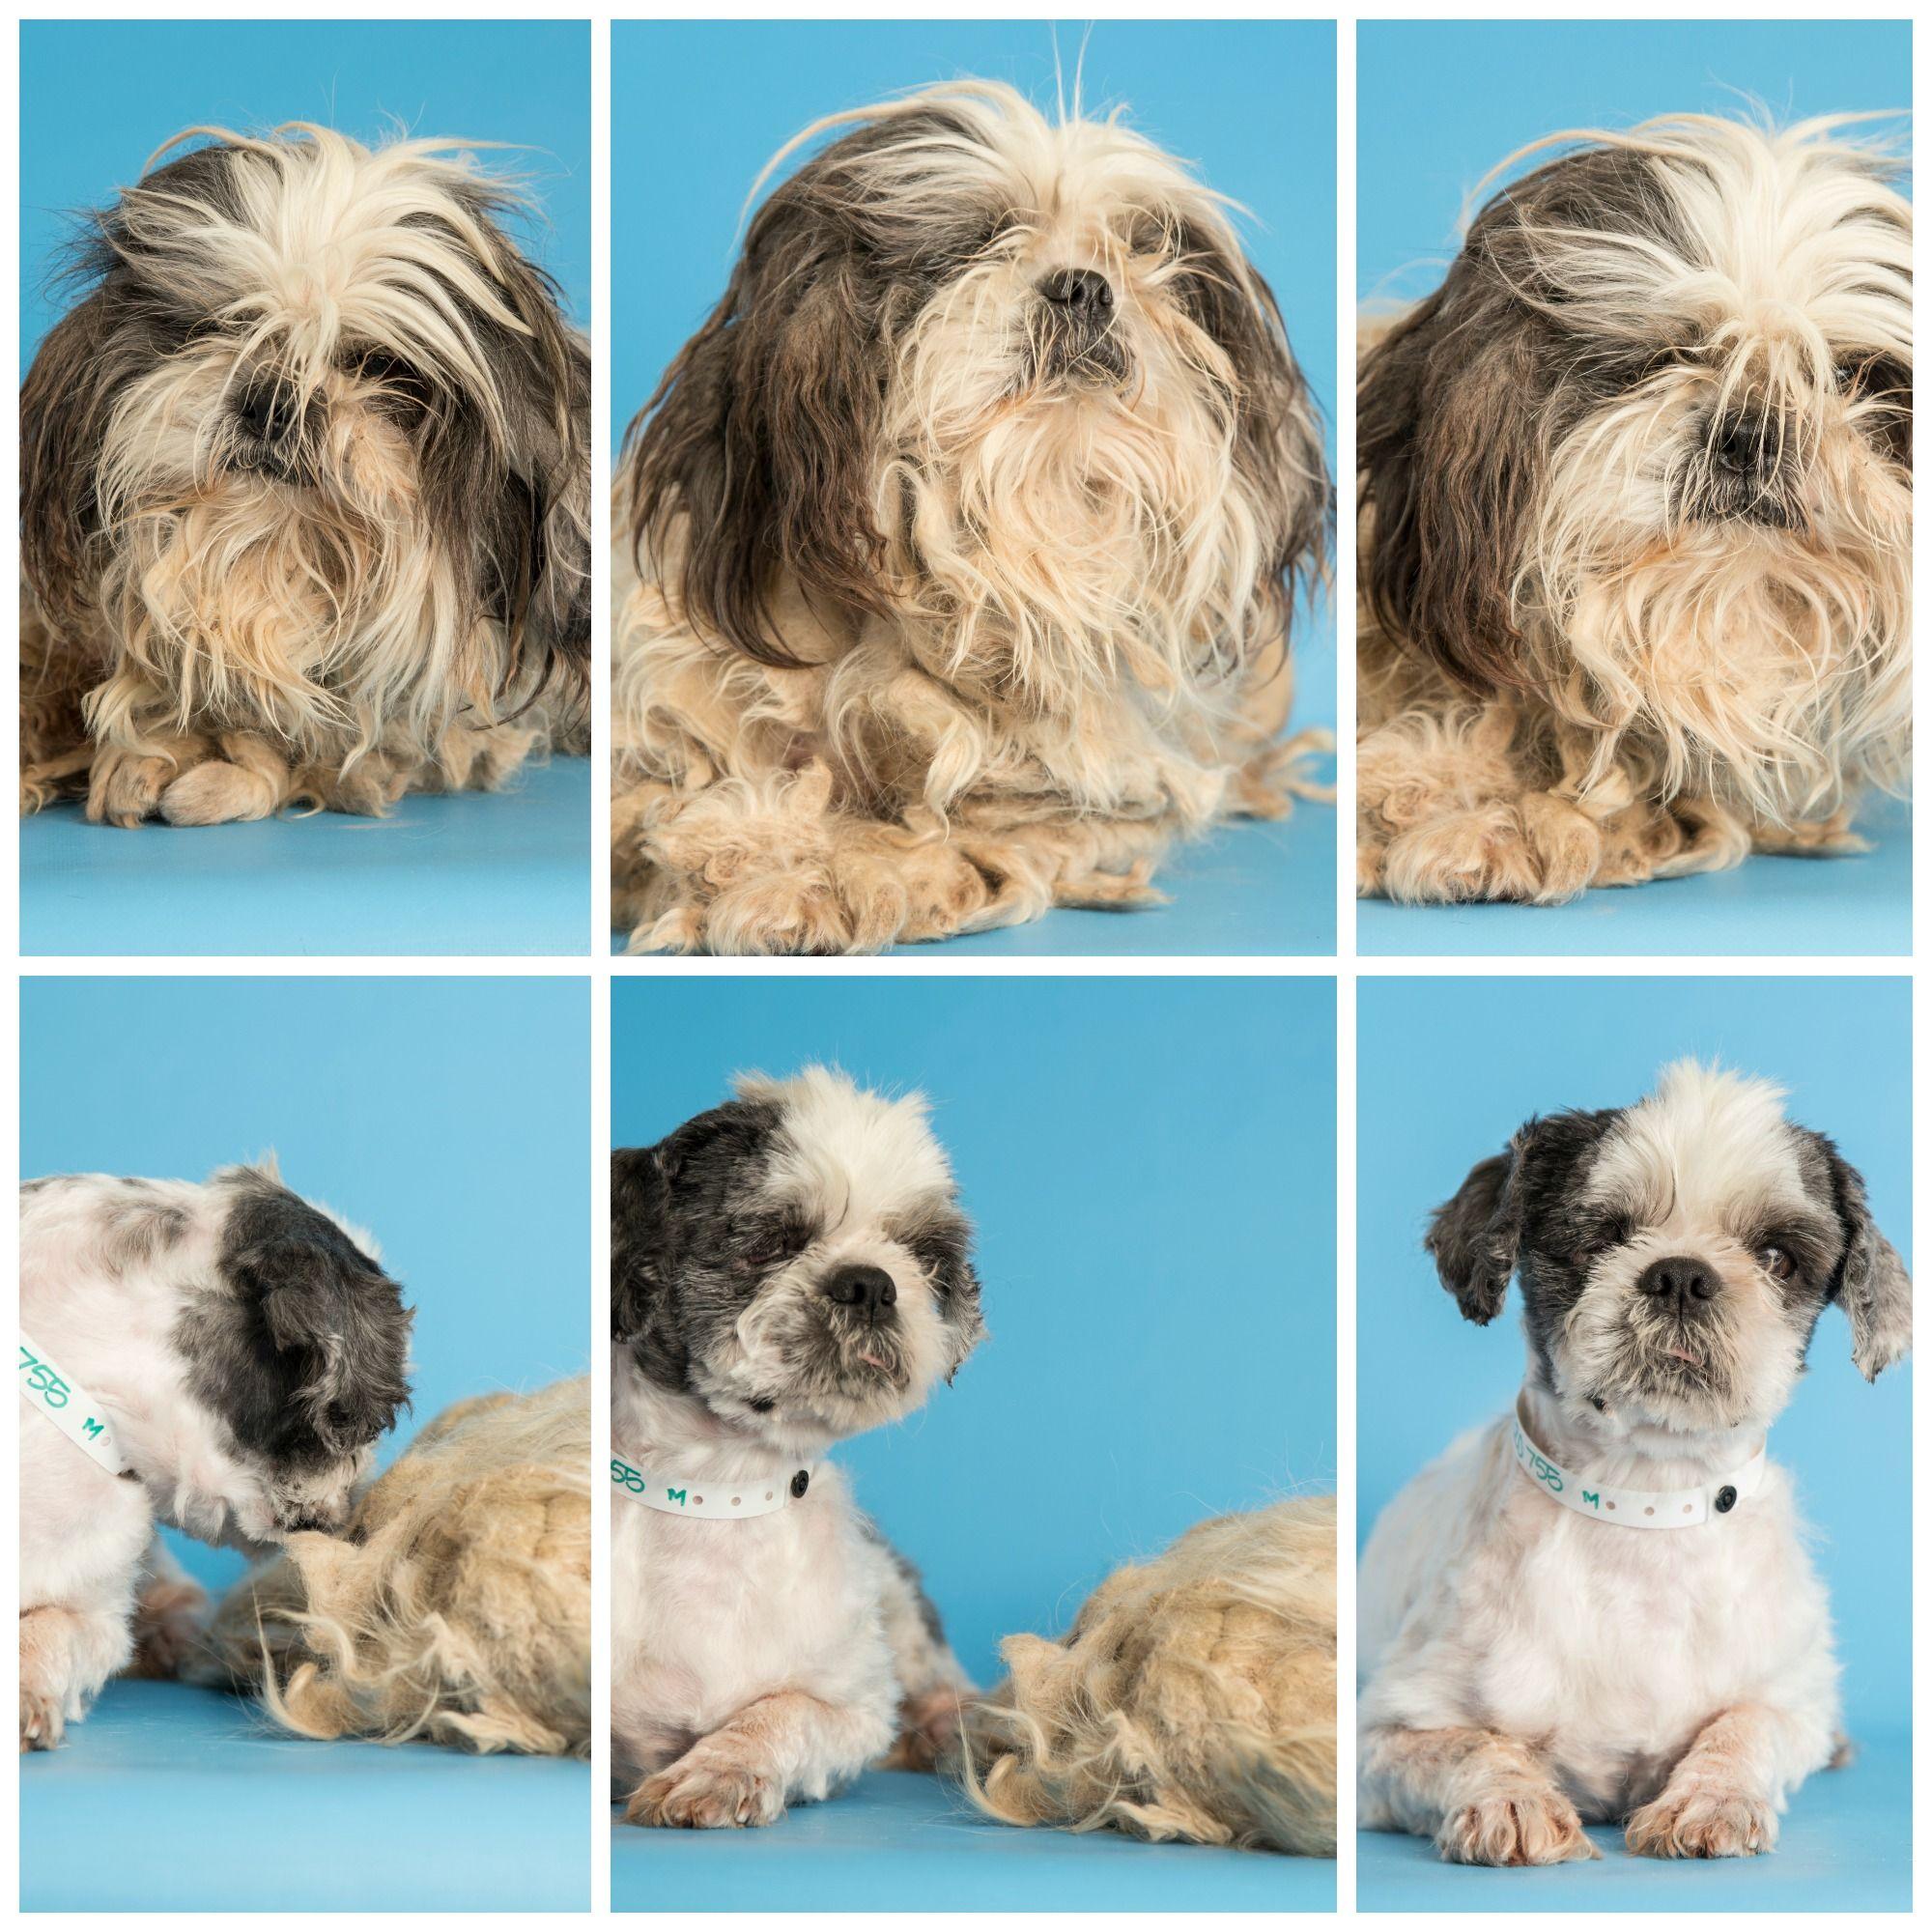 Transformation Tuesday Todd Arizona Humane Society Humane Society Shelter Dogs Amazing Transformations